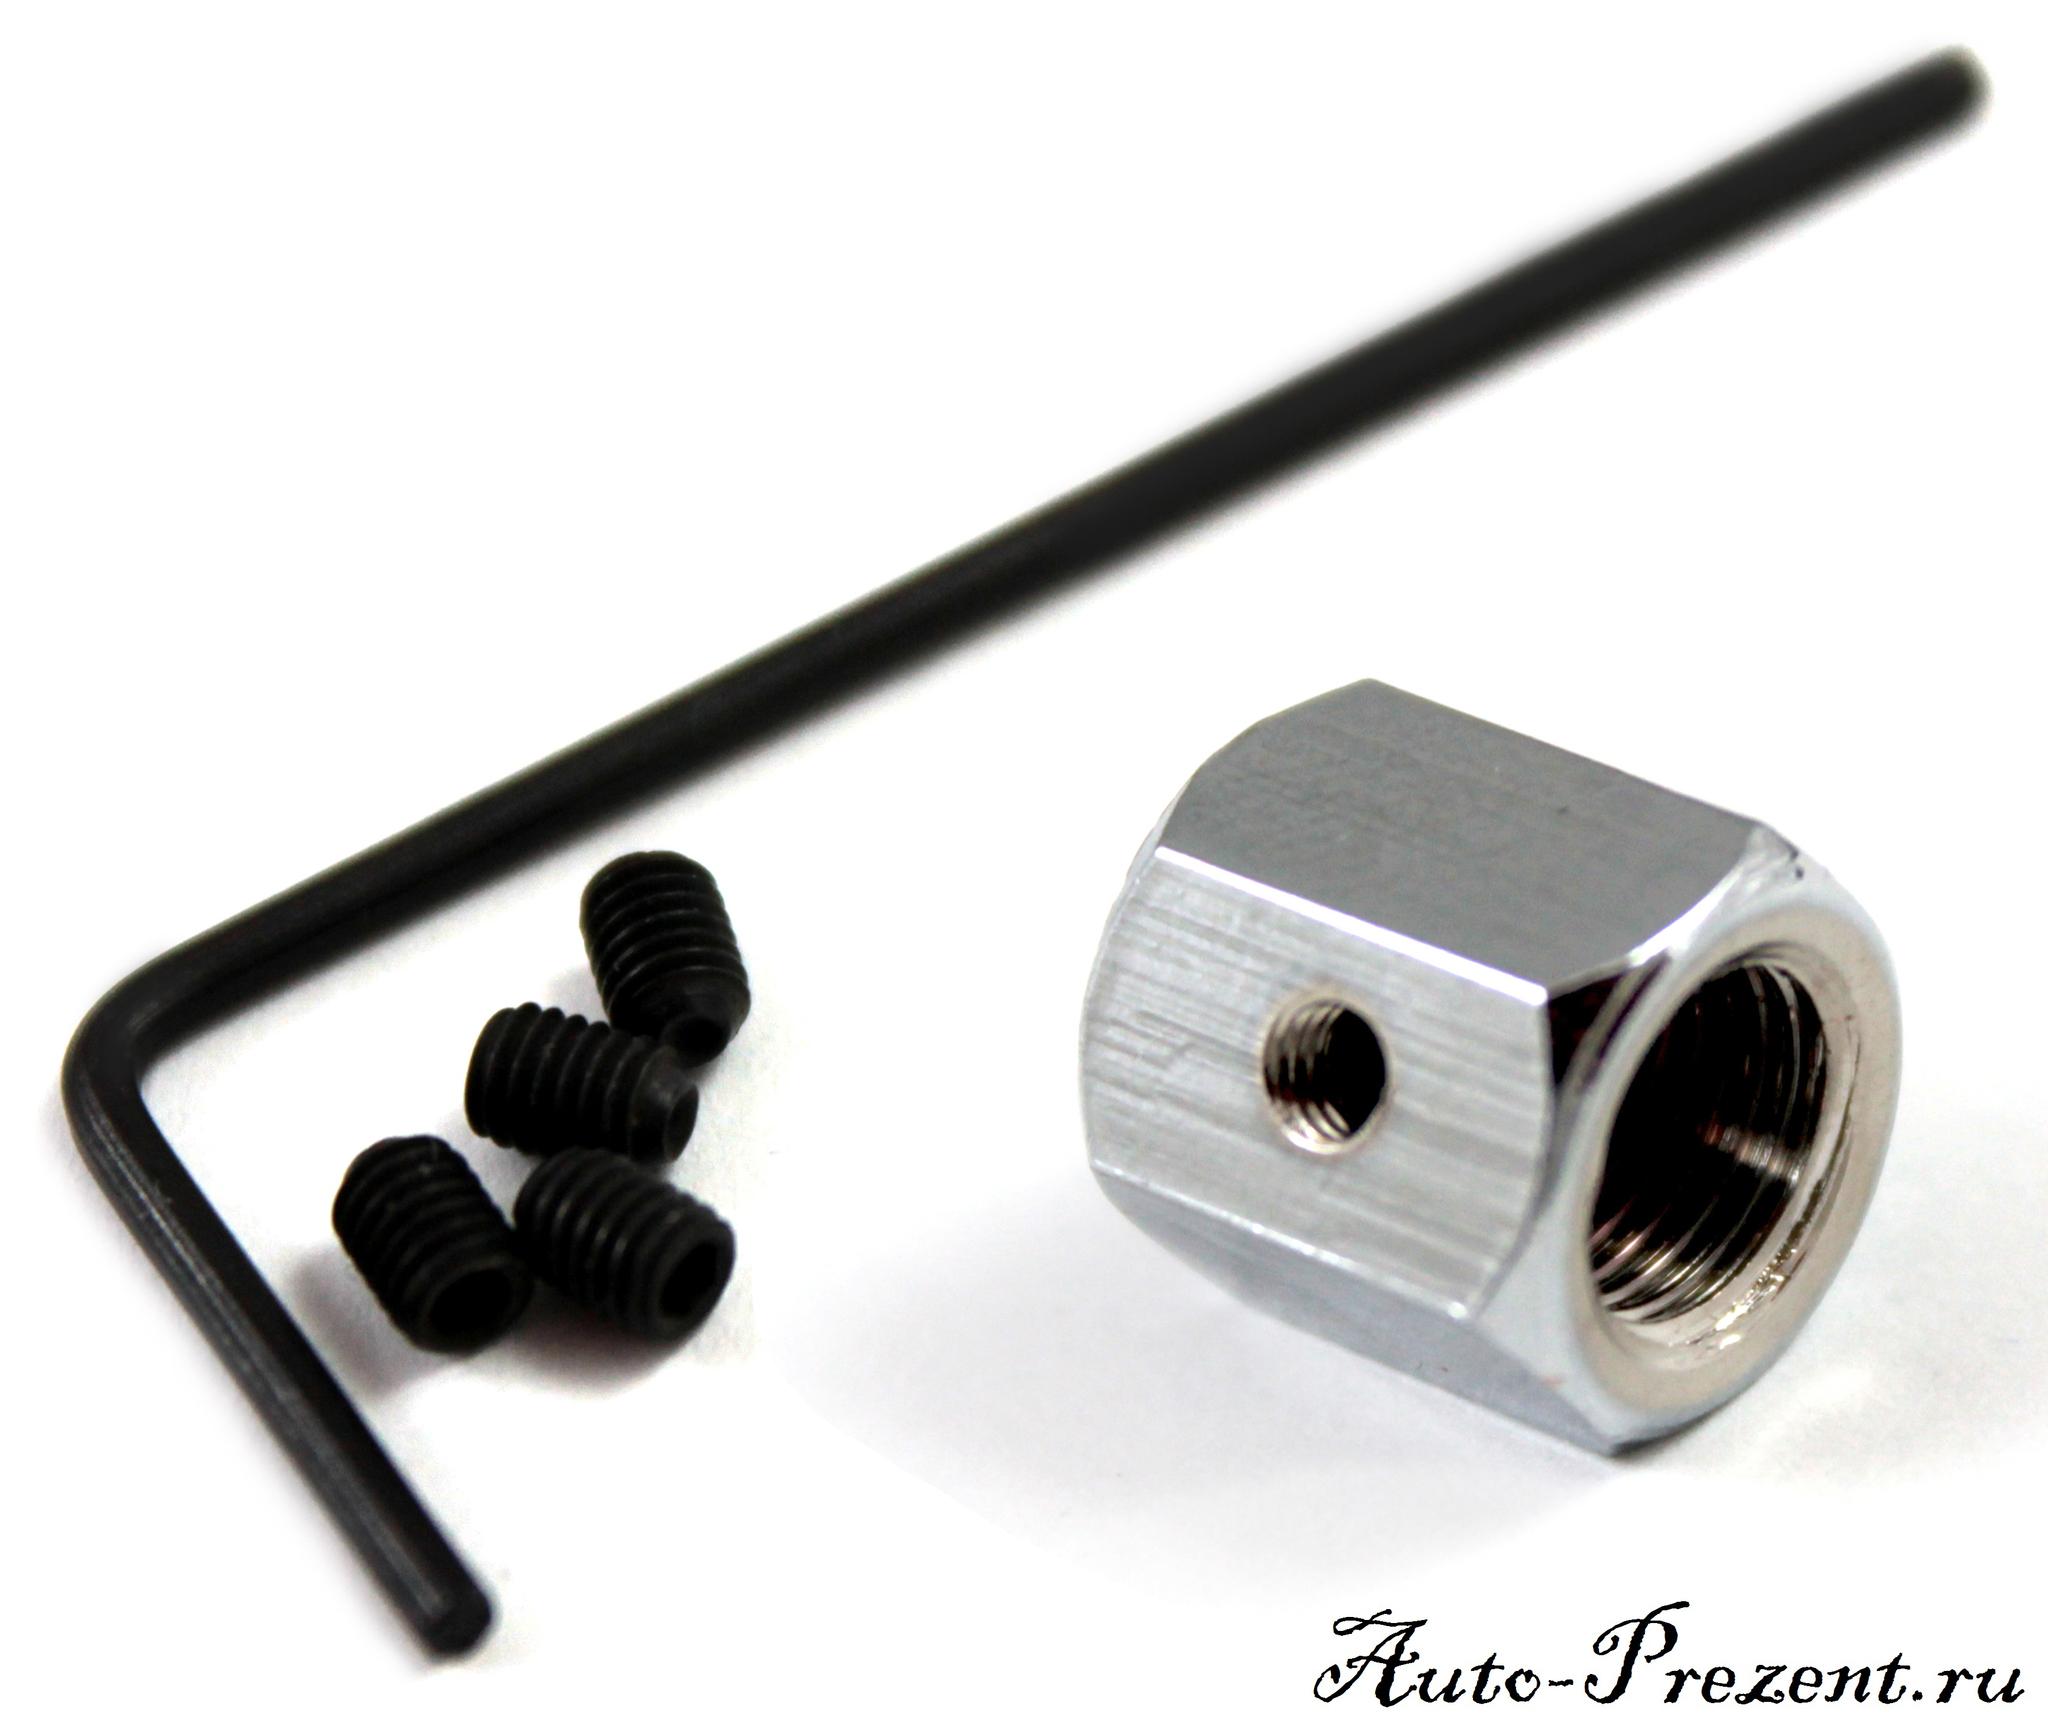 Колпачки на ниппель MERCEDES-BENZ с защитой от кражи